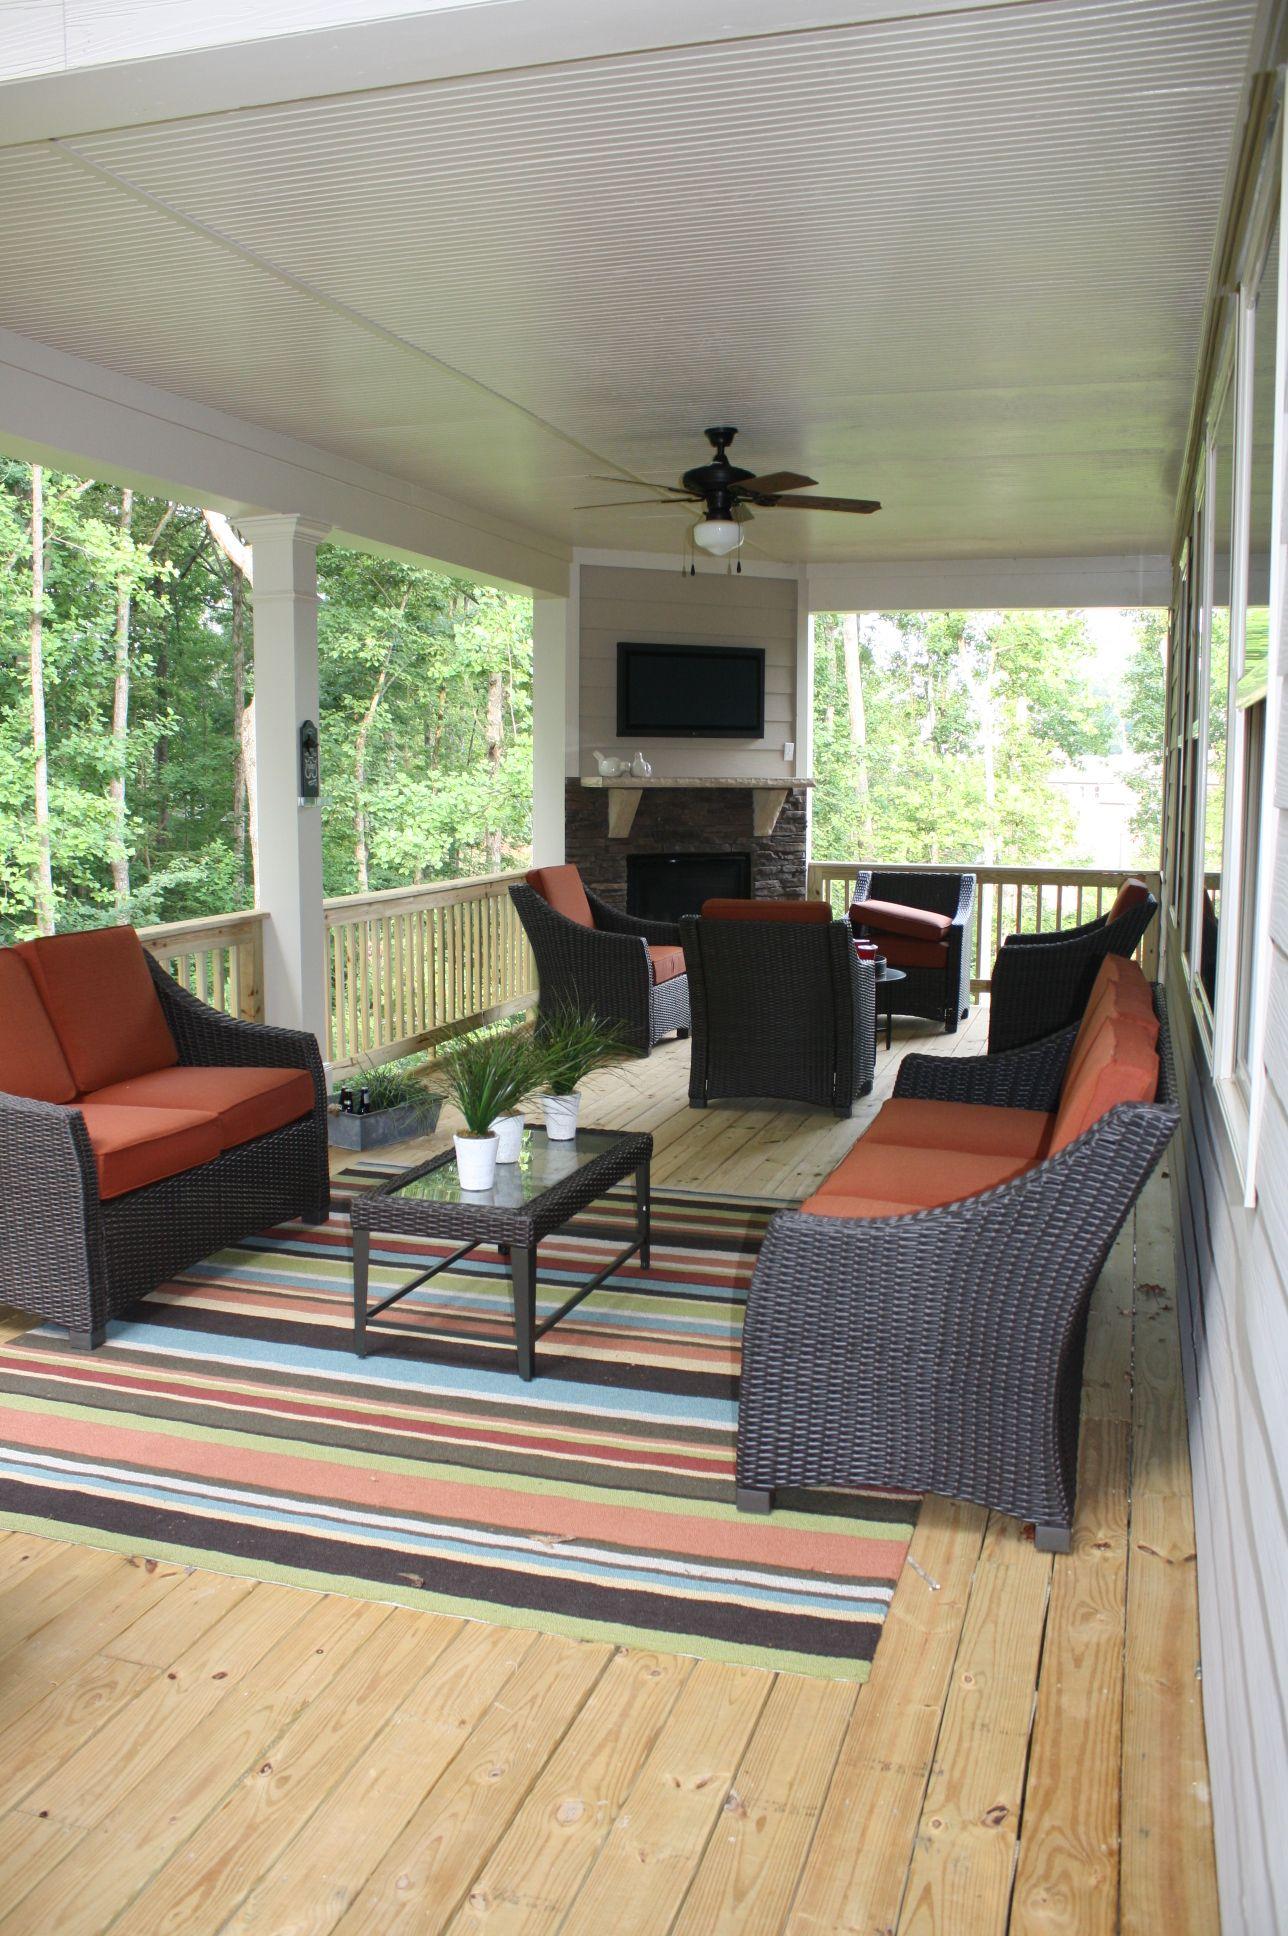 haddonstone gameday porch fireplace haddonstone community